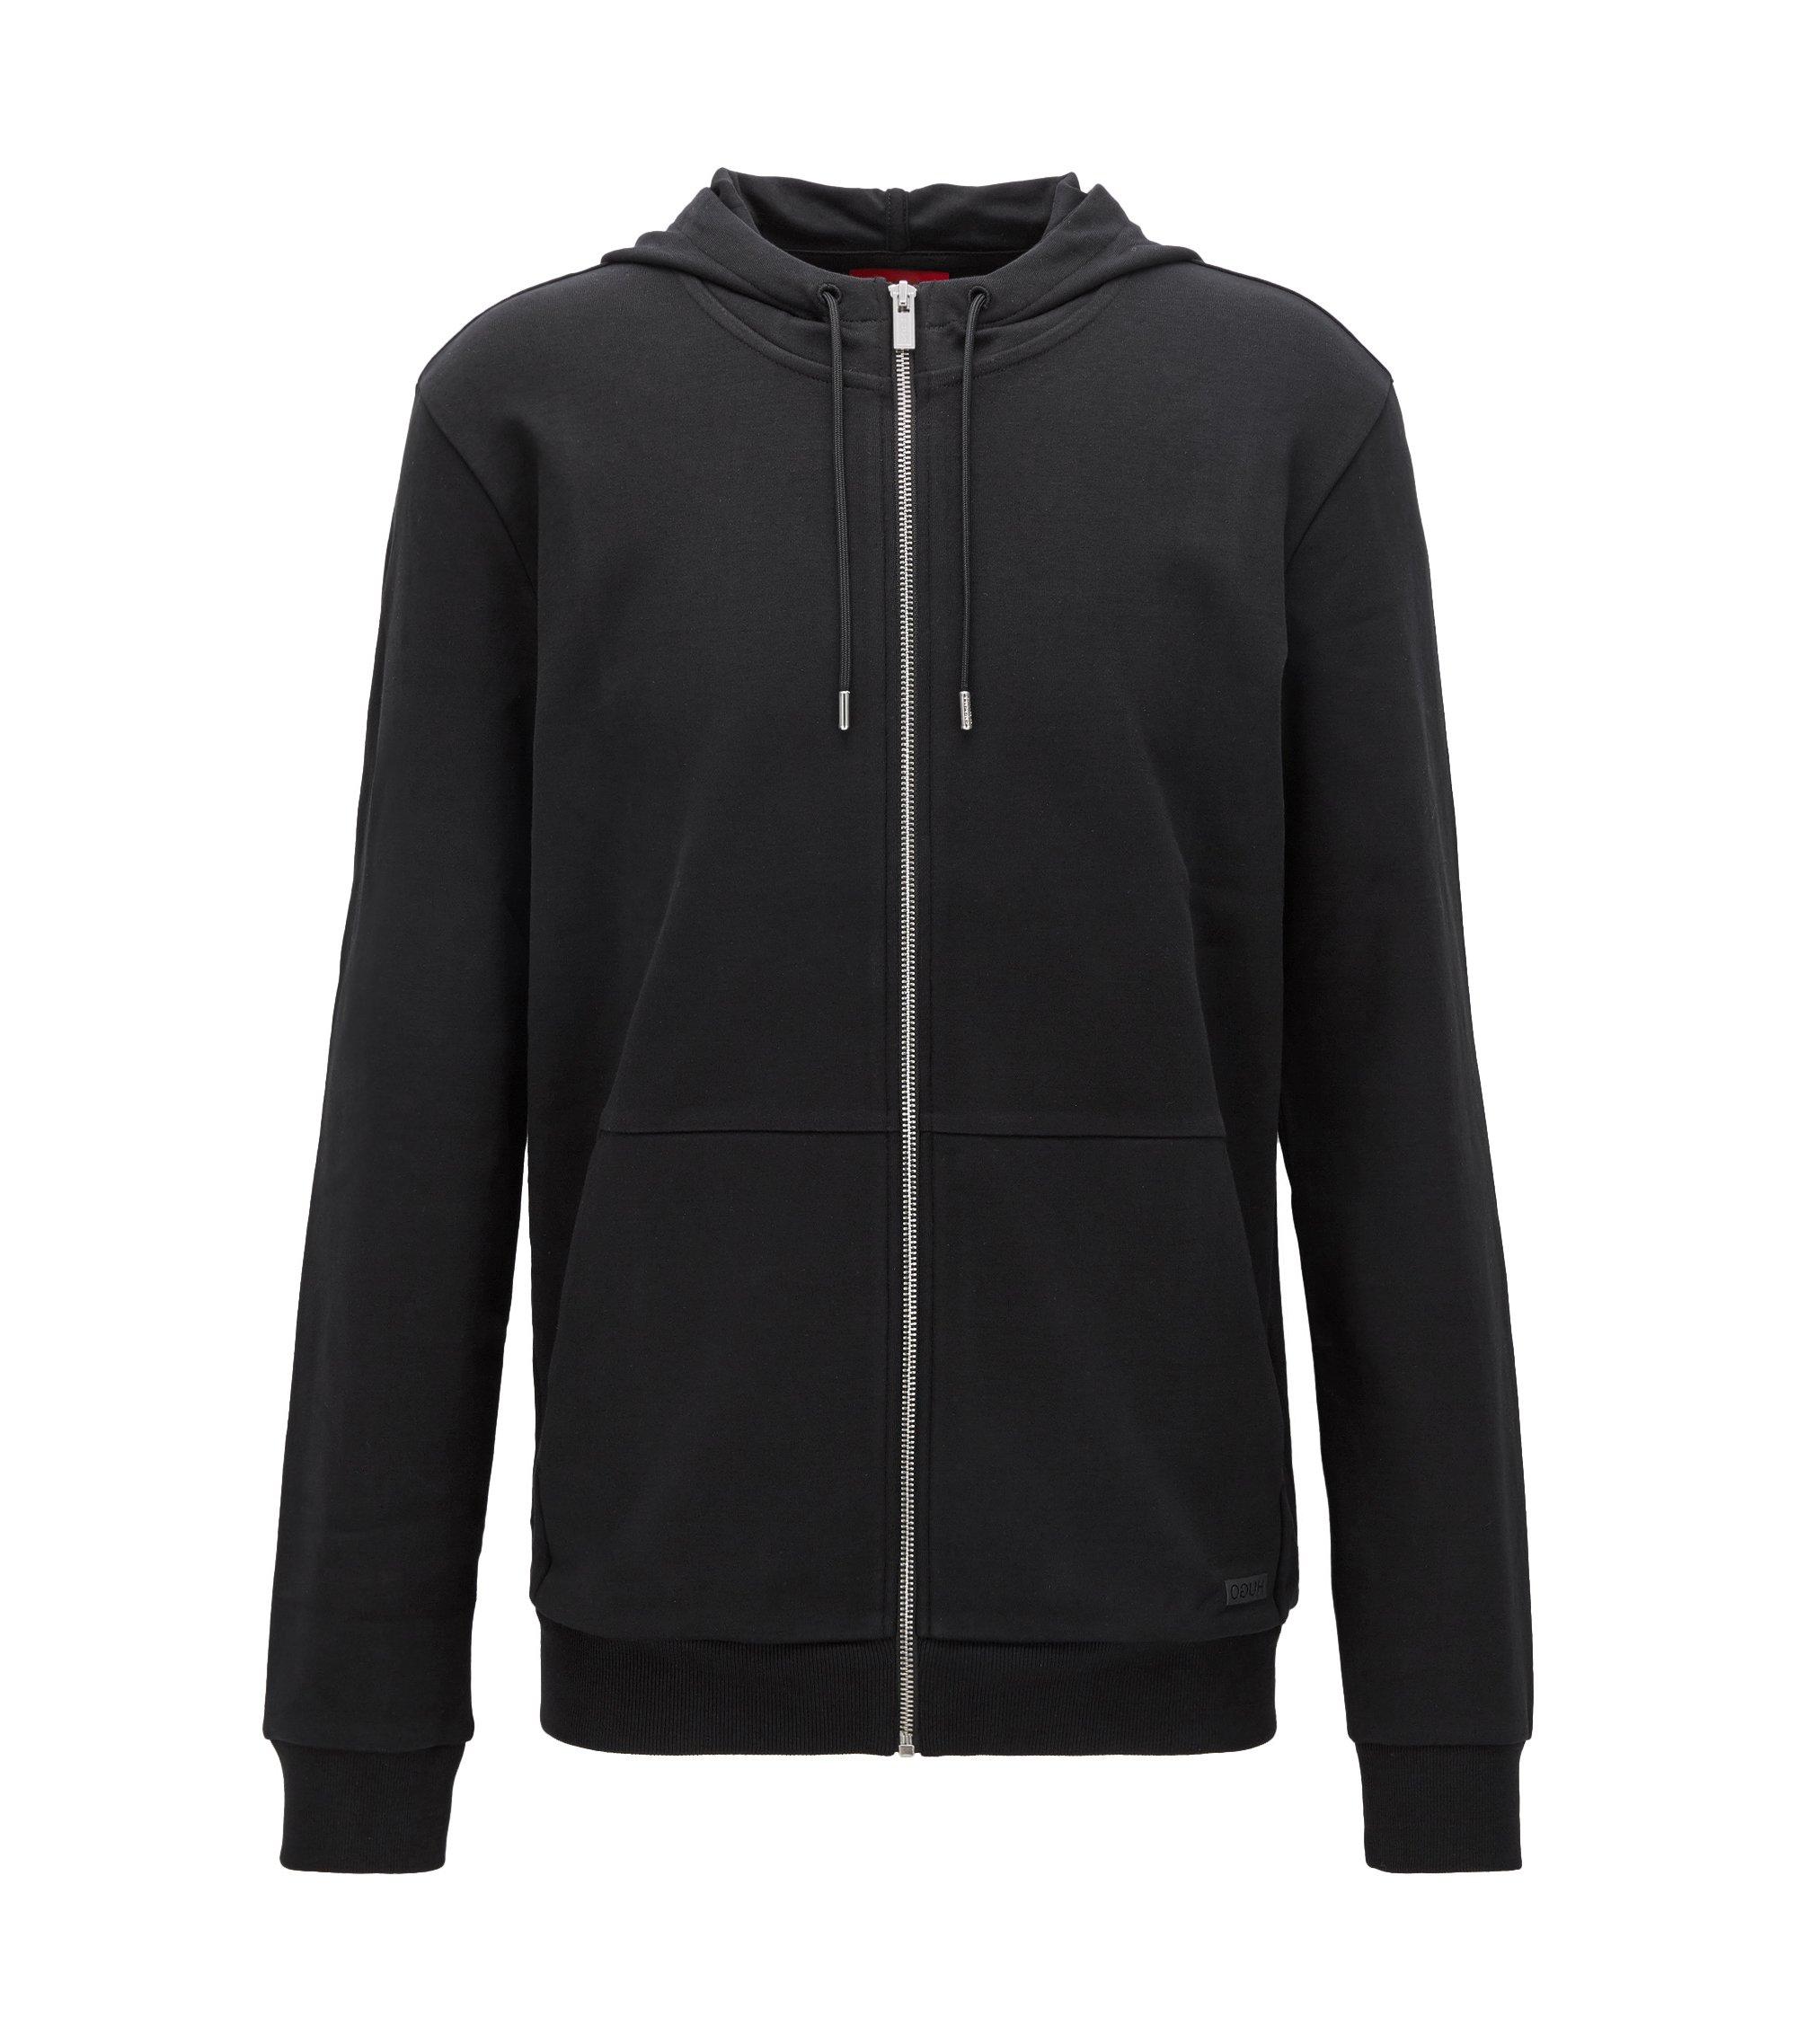 Cotton Full-Zip Hooded Sweater | Dattis, Black